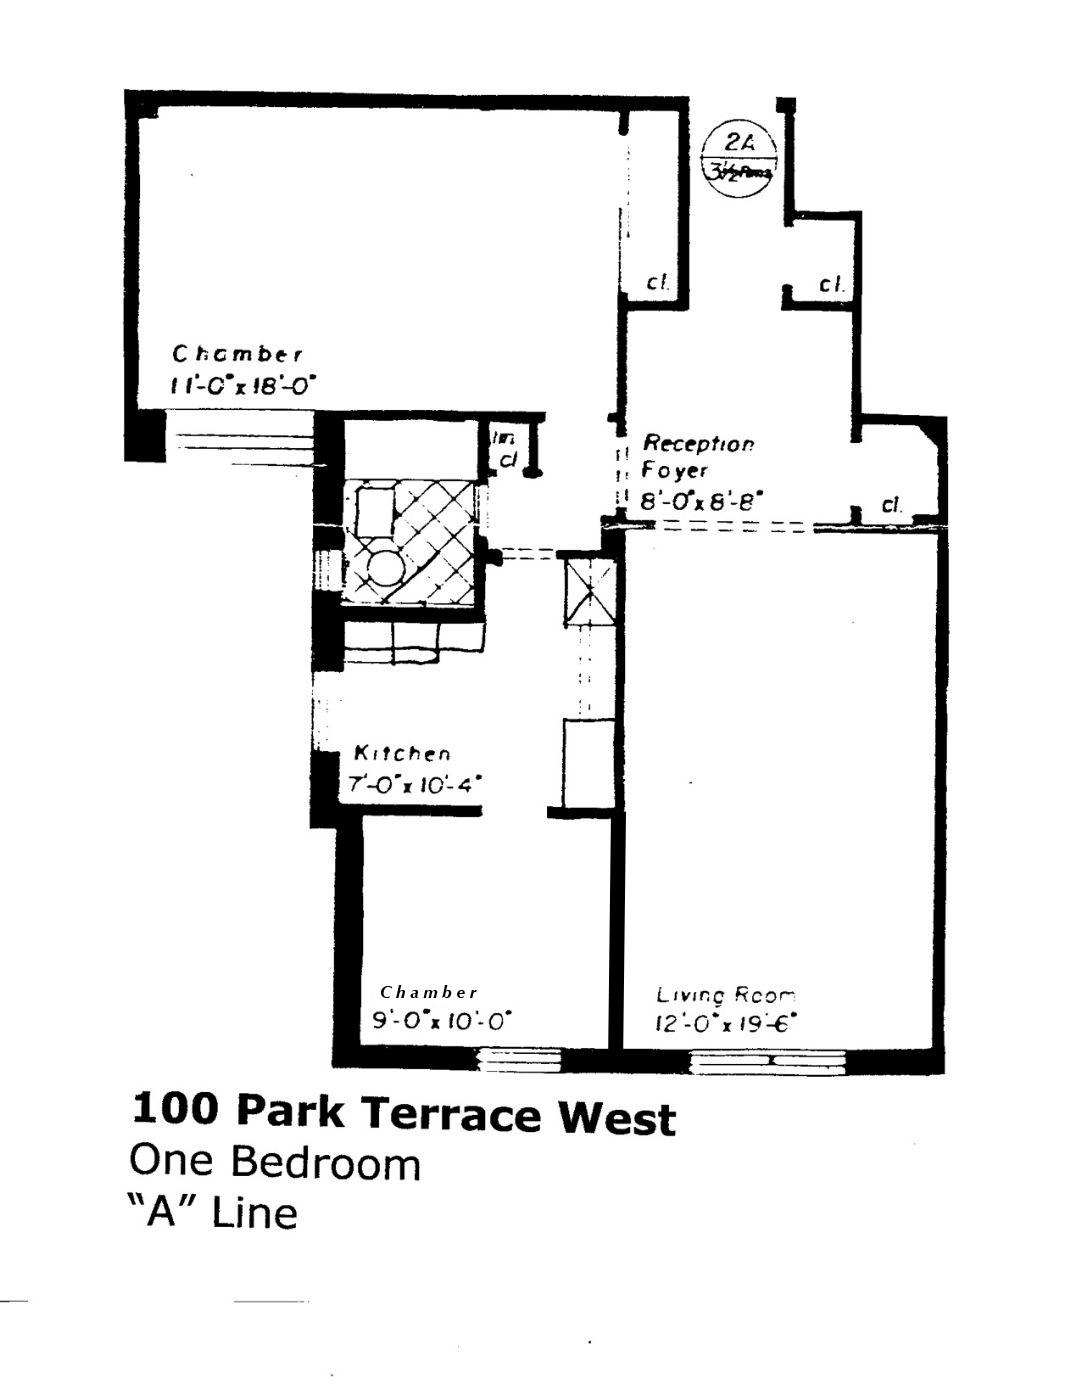 Streeteasy 100 park terrace west in inwood 3a sales for 100 park terrace west